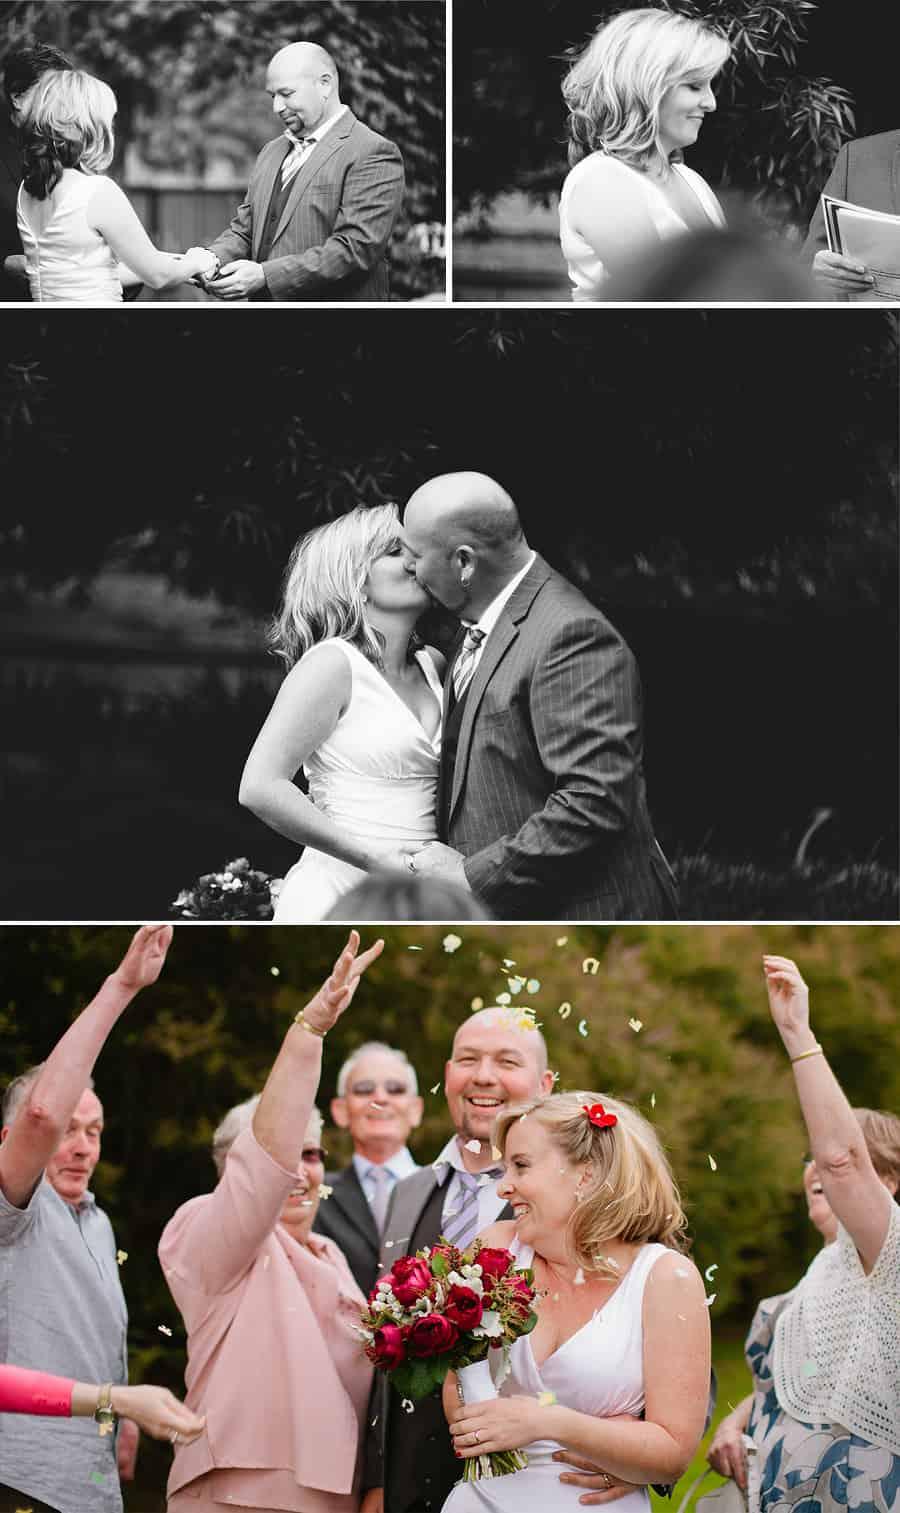 Haley & Rus Wedding - First Kiss